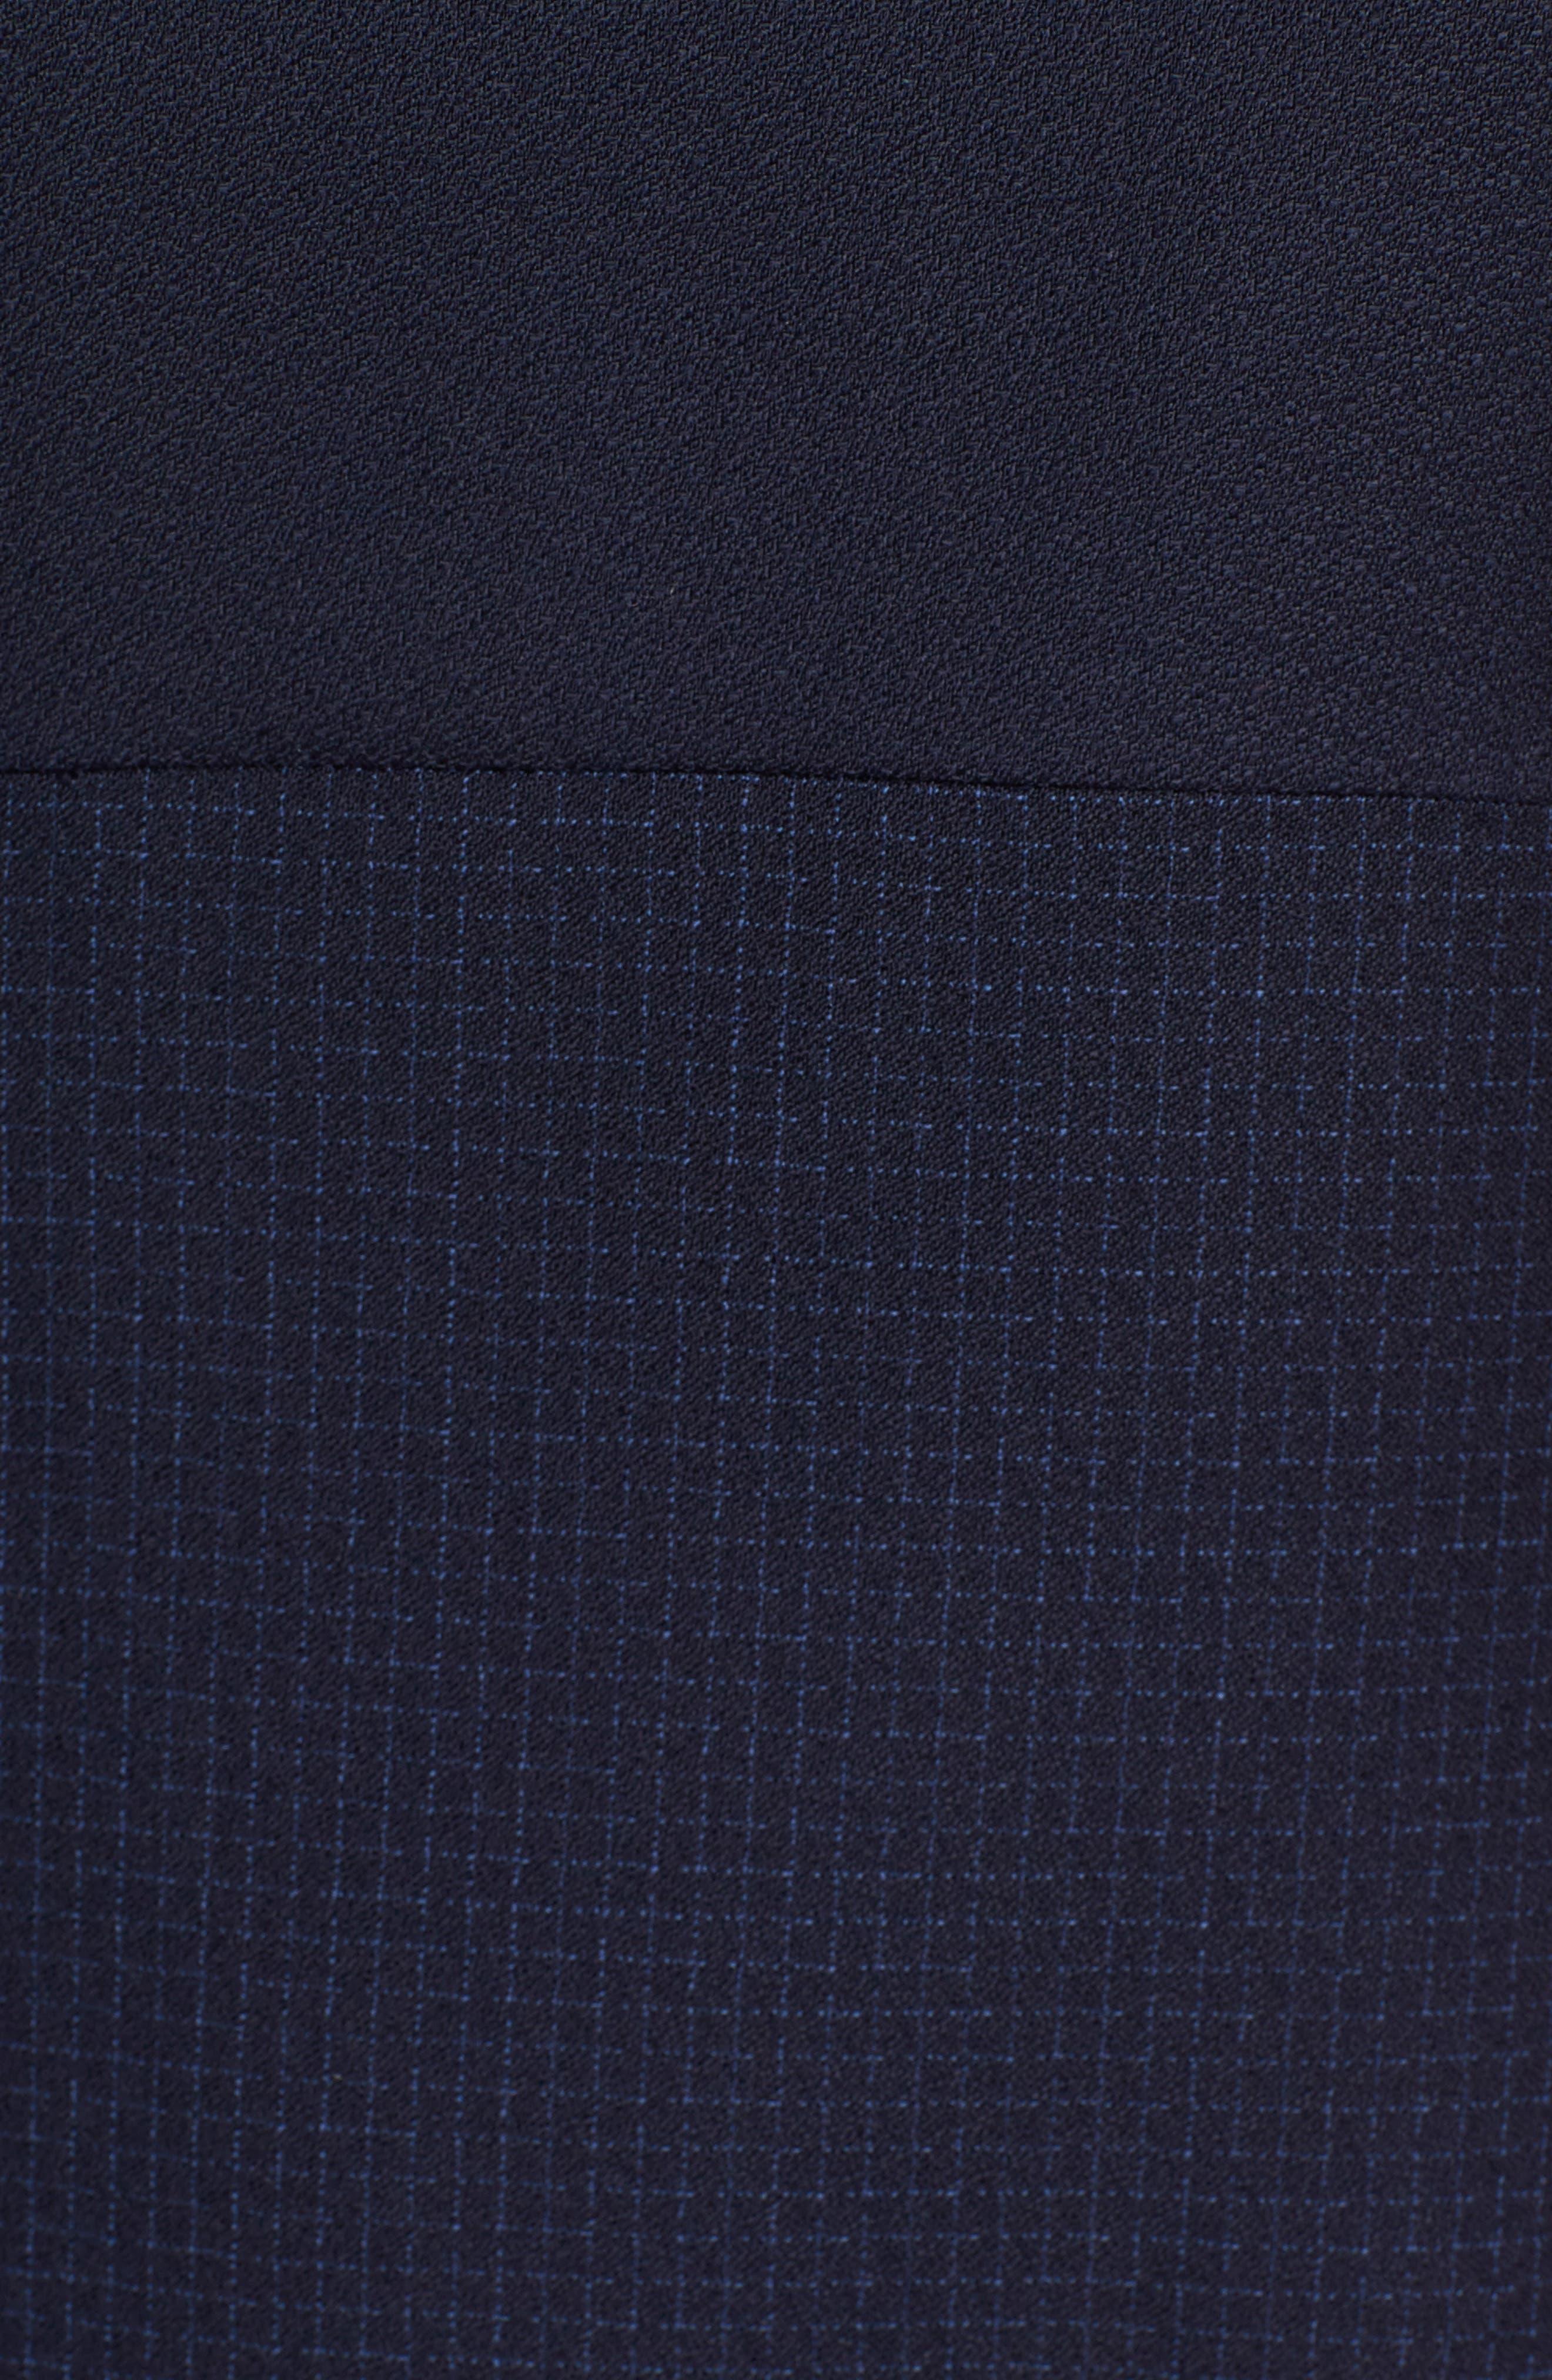 Dibena Windowpane Sheath Dress,                             Alternate thumbnail 6, color,                             Blue Fantasy